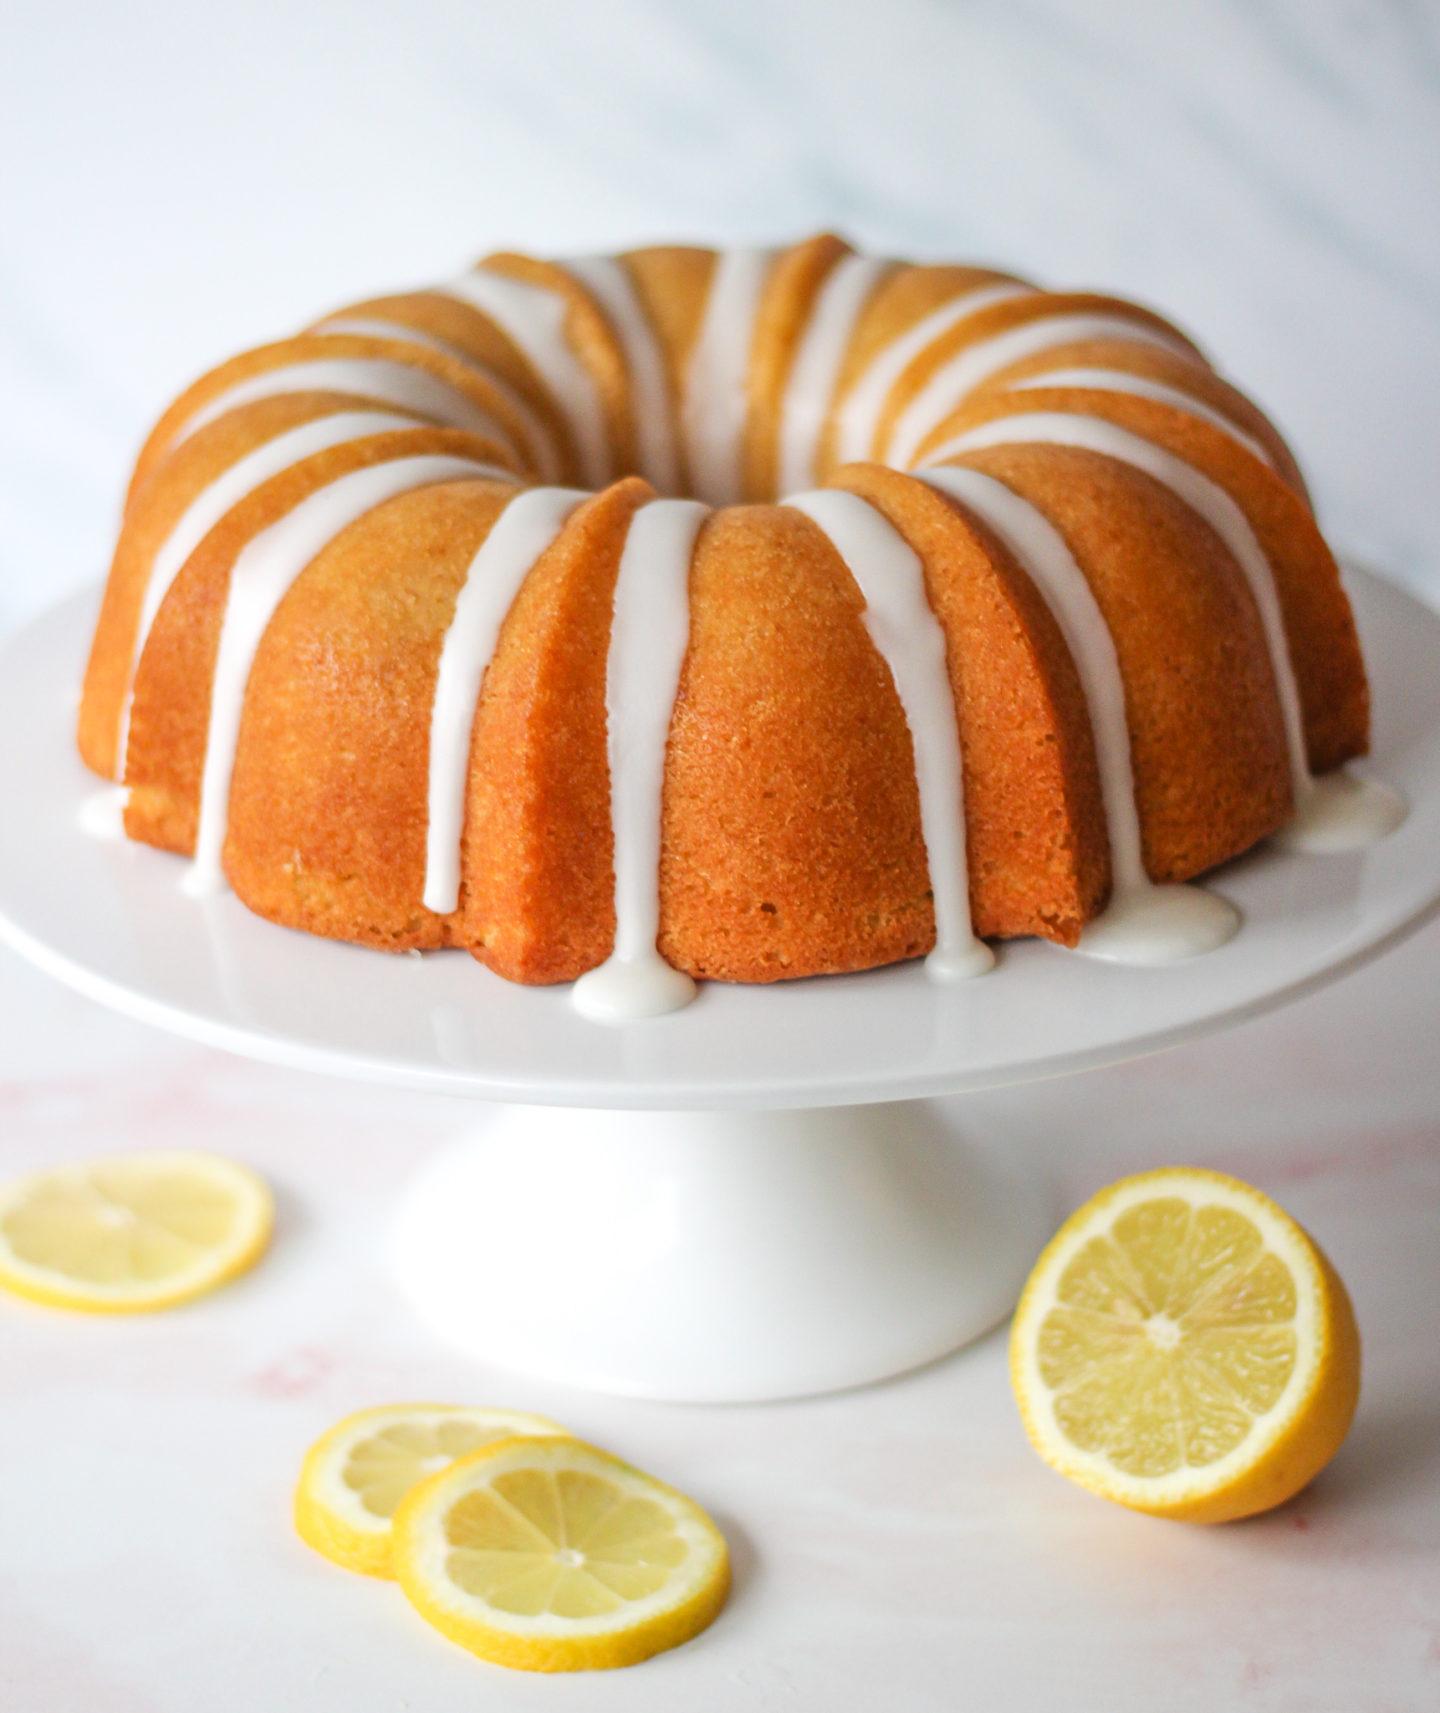 Whole unsliced lemon drizzle bundt cake on a cake stand